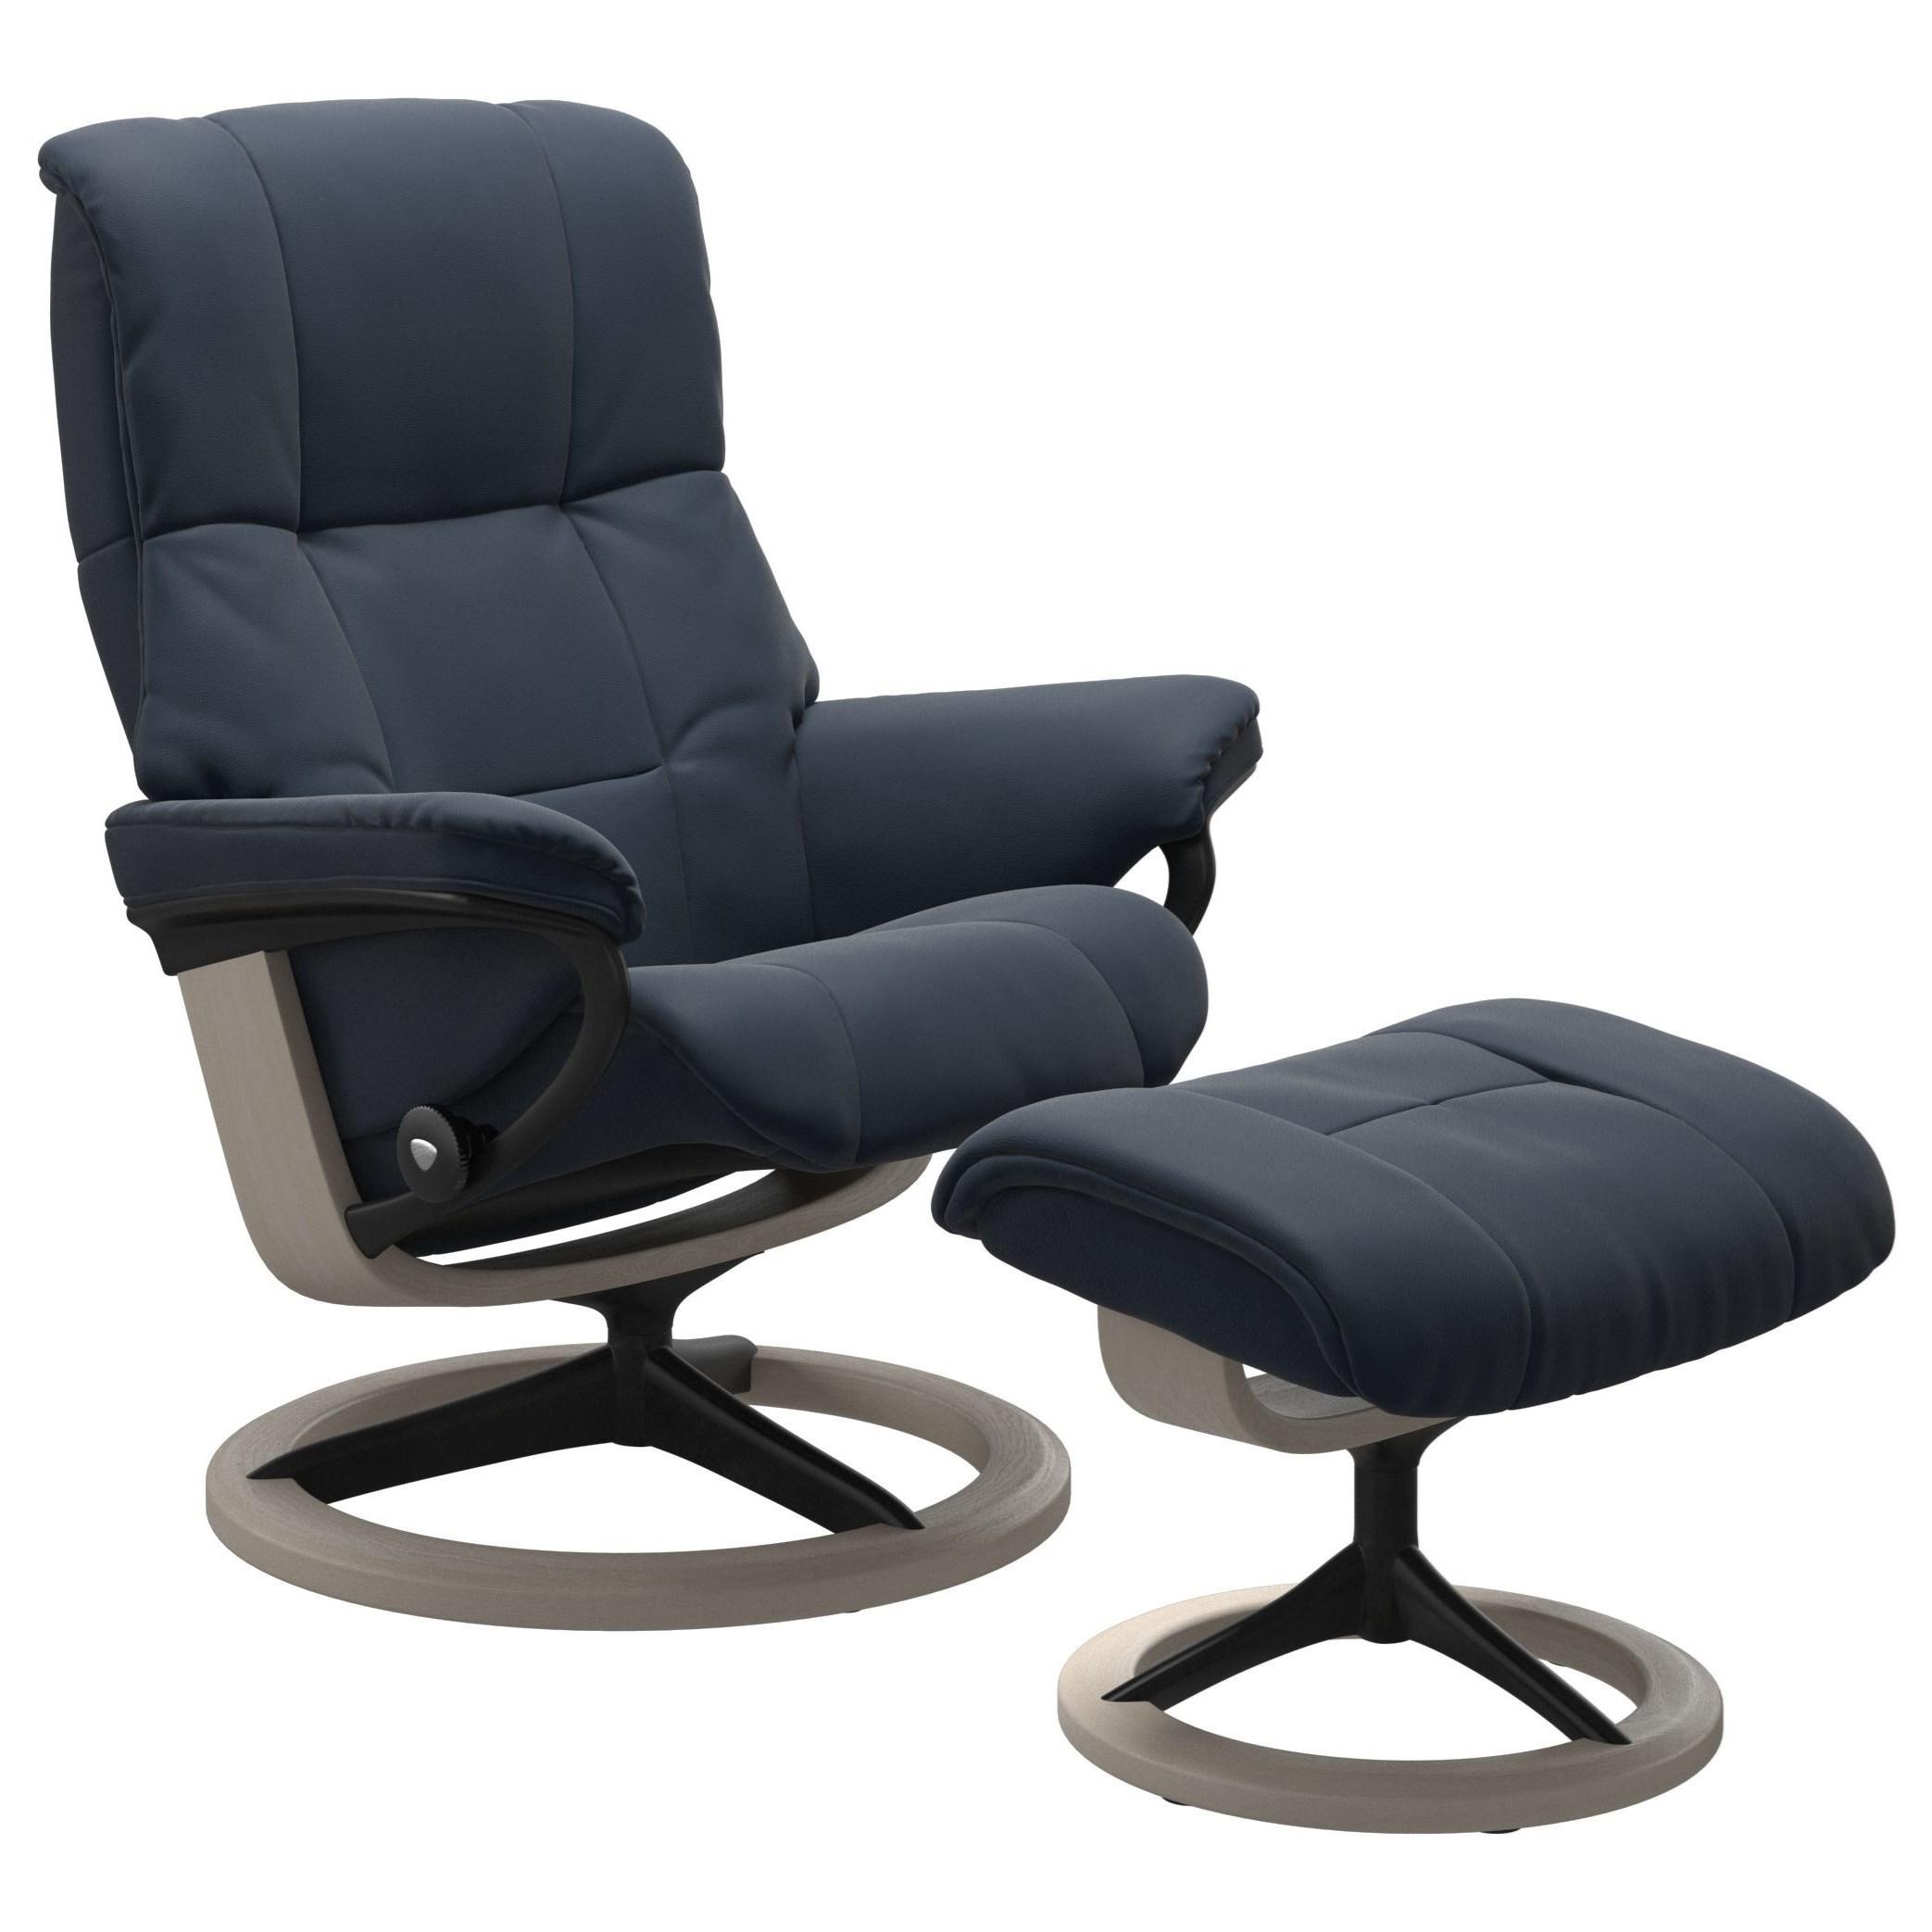 Mayfair Medium Reclining Chair and Ottoman by Stressless at HomeWorld Furniture